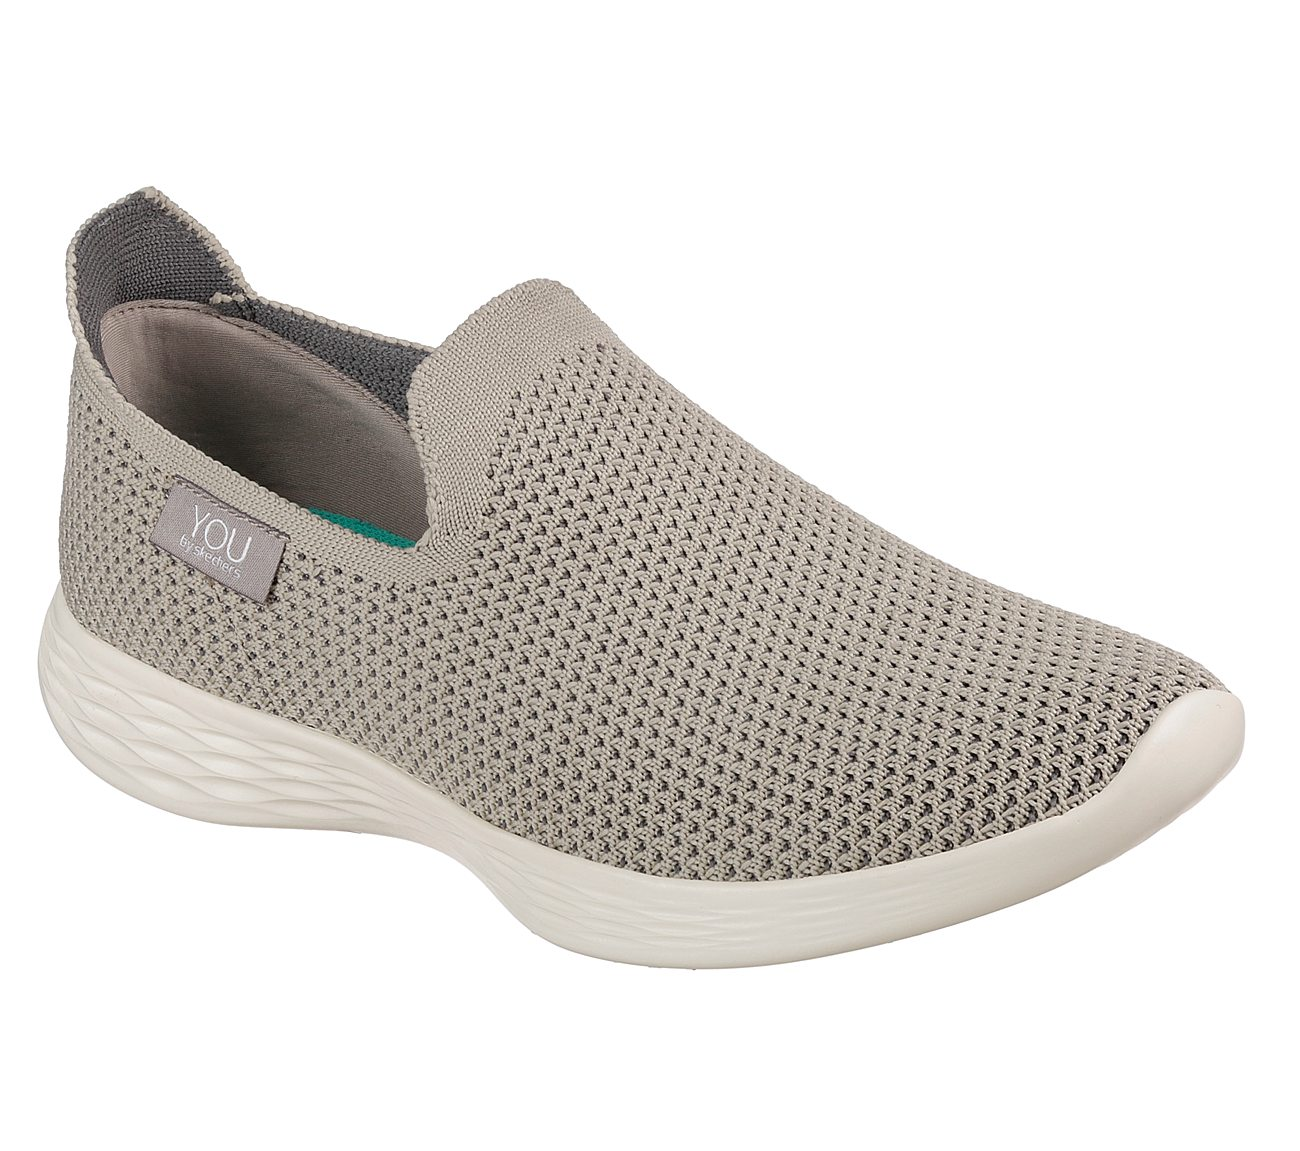 Where To Buy Skechers Zen Shoes